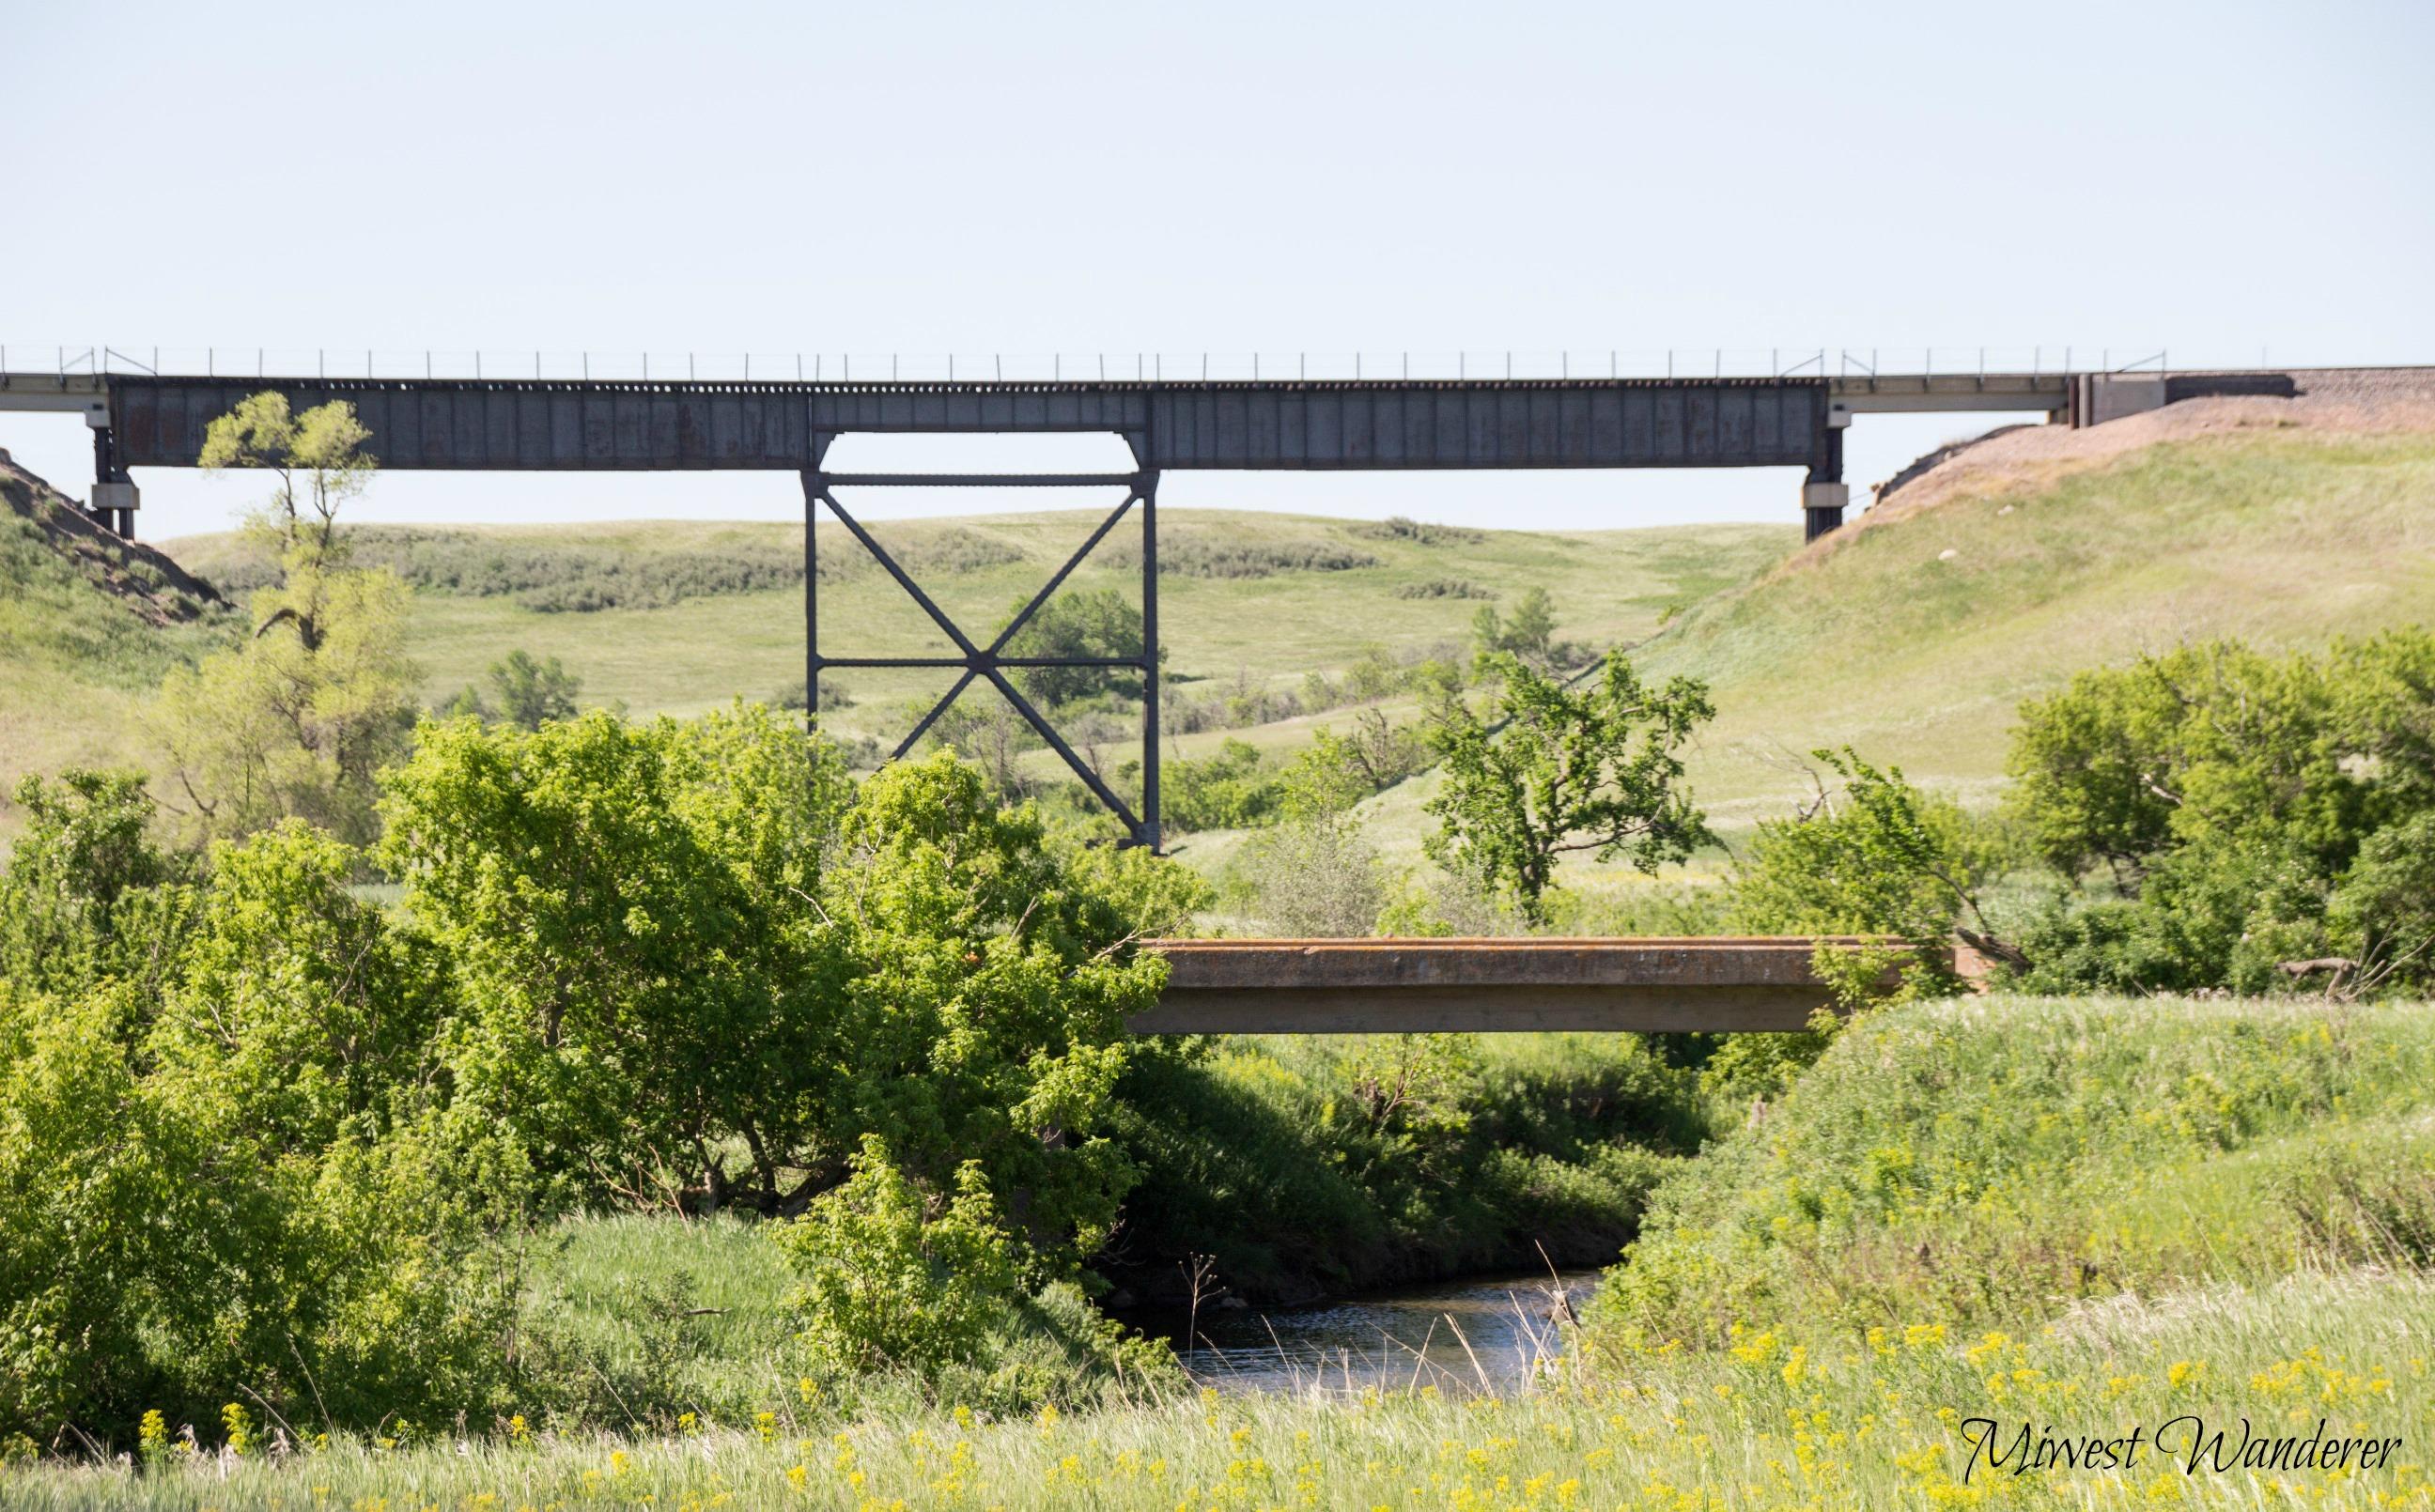 North dakota morton county glen ullin -  Near Glen Ullin North Dakota Cattle Tractor Bridges